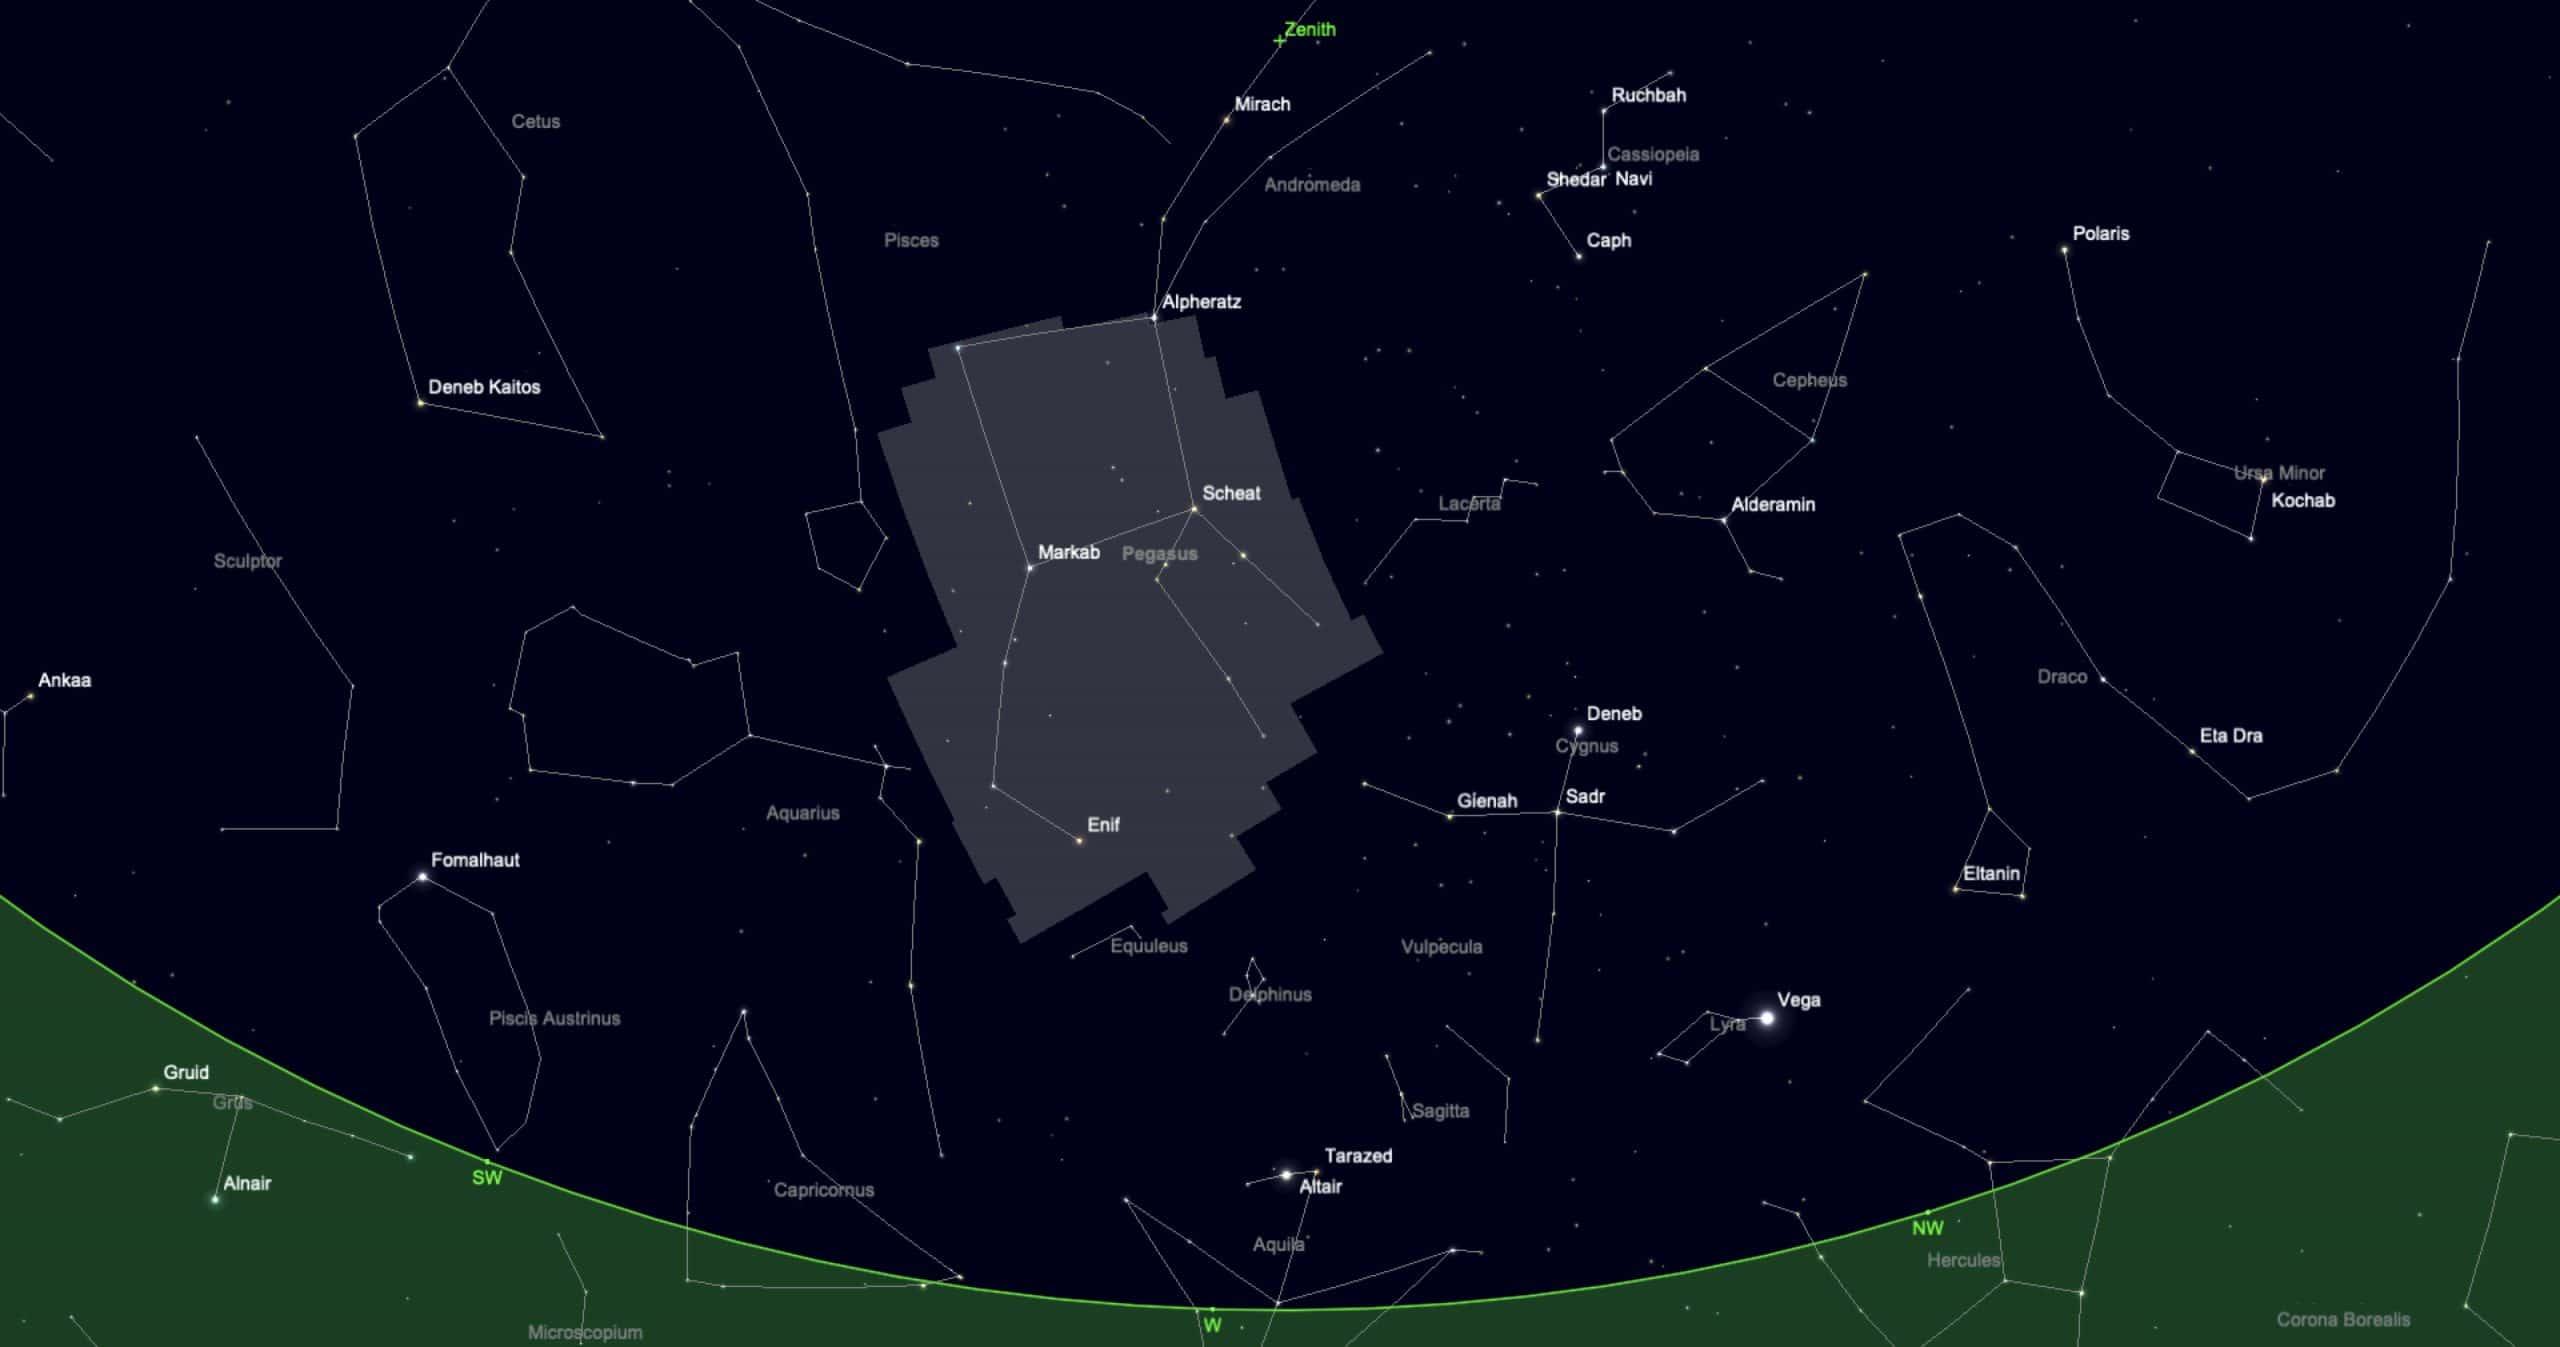 Finding Pegasus in the night sky